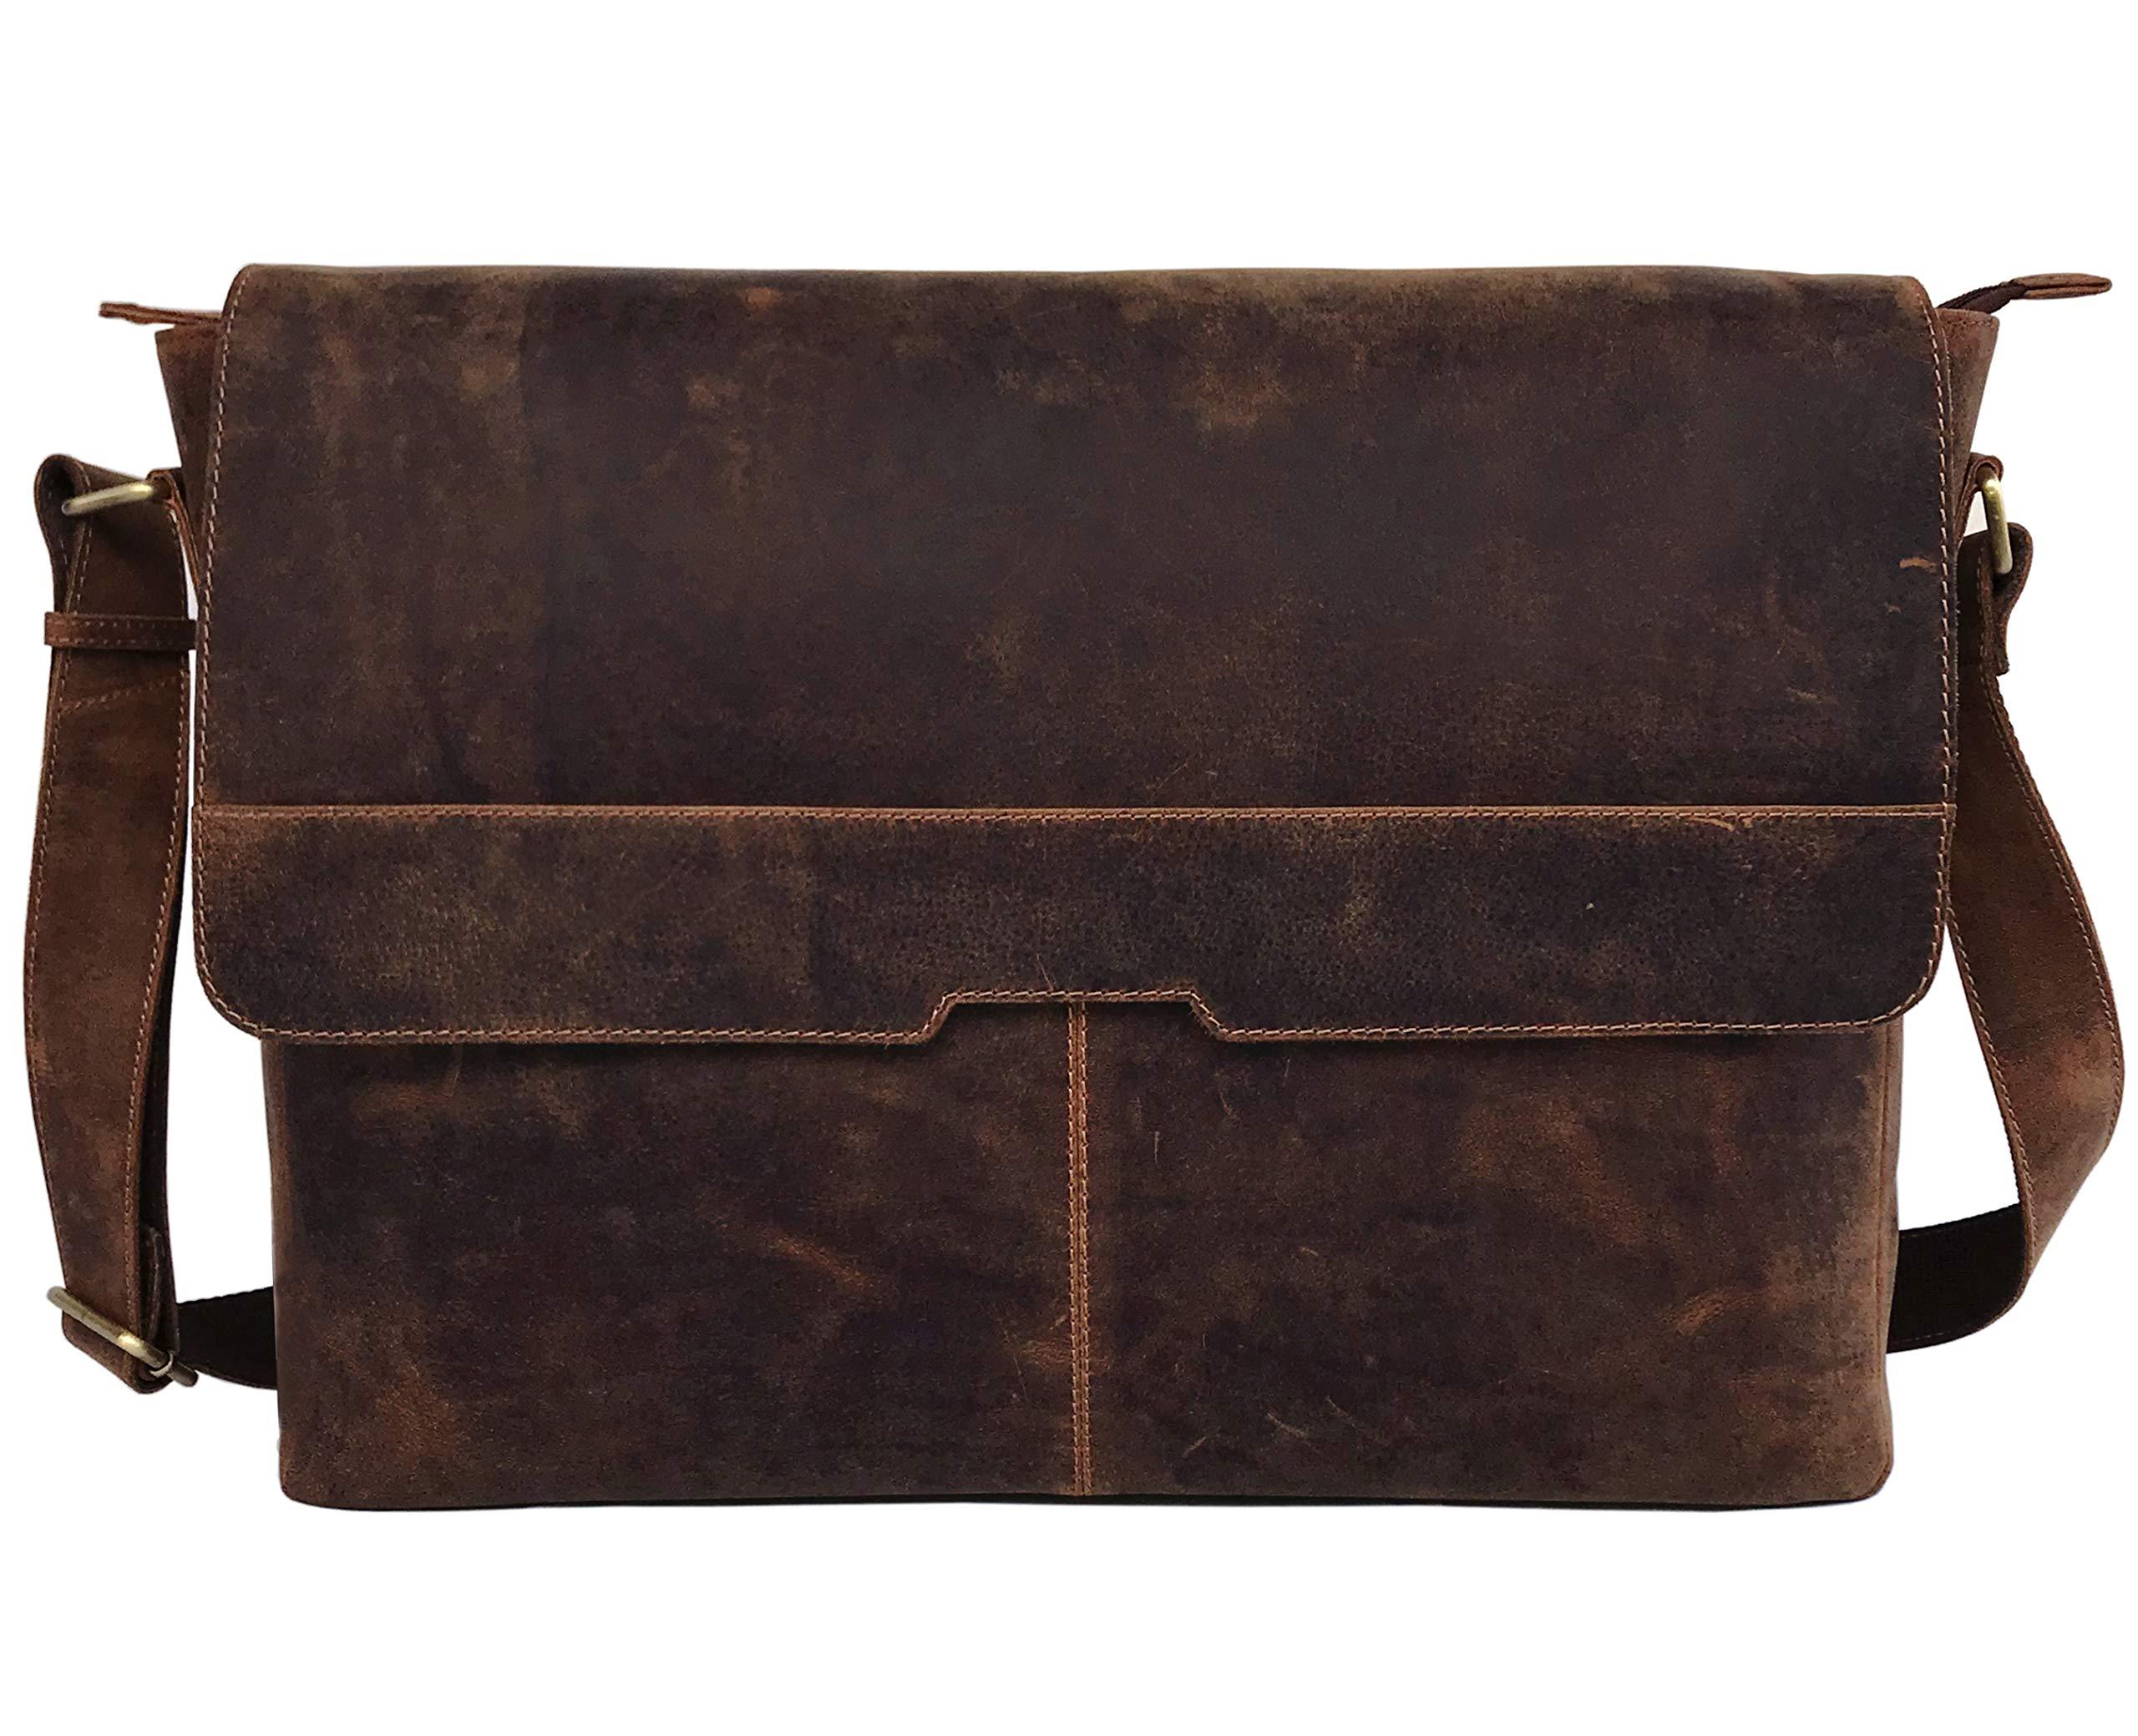 18'' Leather Messenger Bag Vintage Buffalo Satchel Laptop Briefcase Unisex Computer Bags for Men Women (Vintage Brown) by cuero (Image #2)